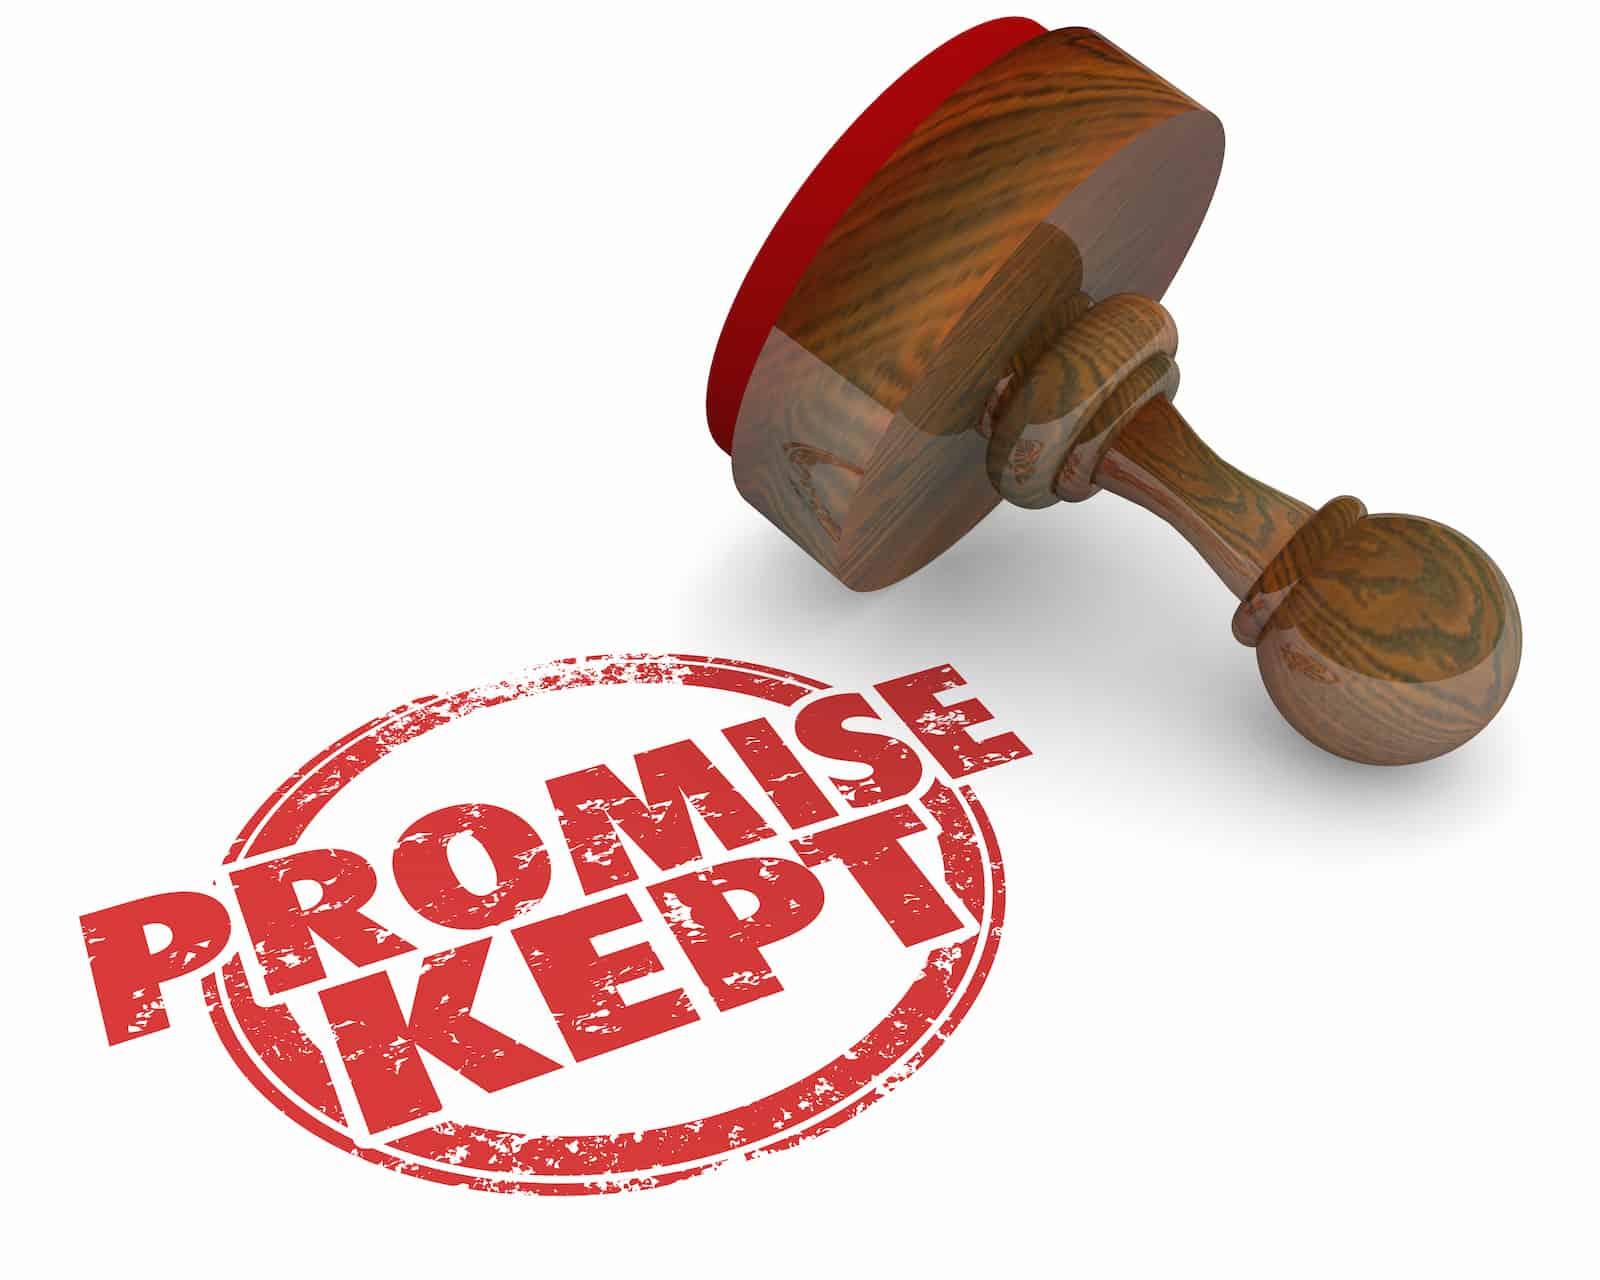 Promise Kept Stamp